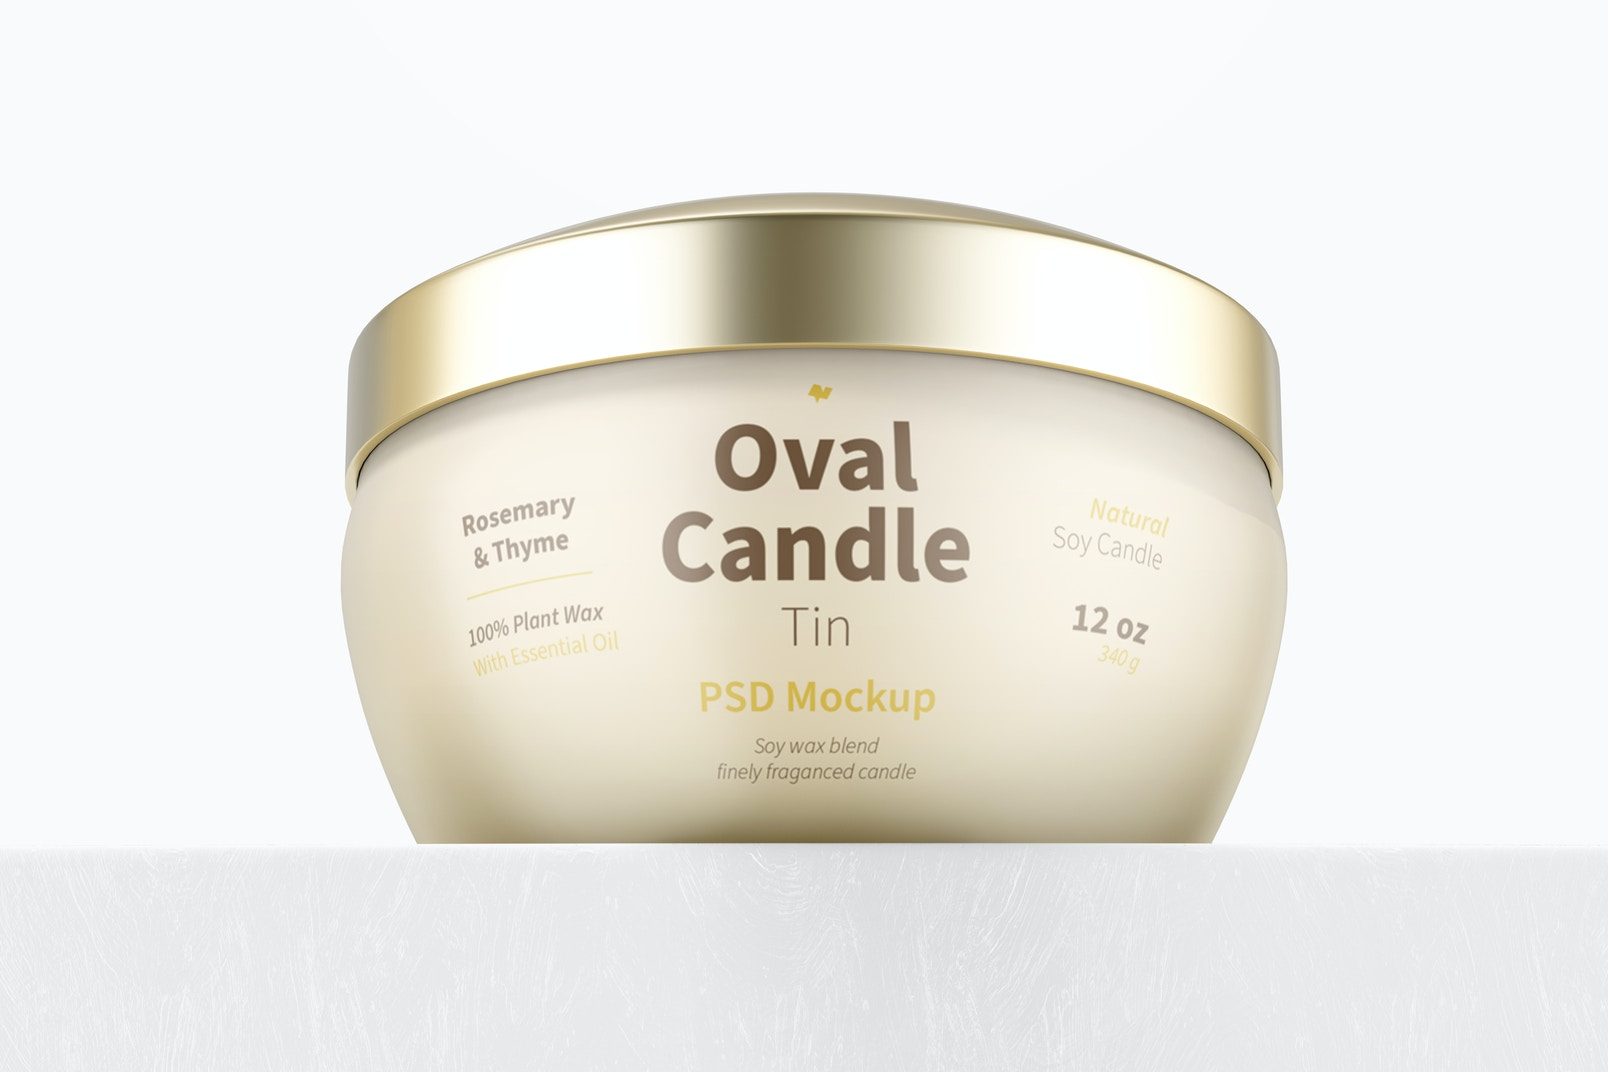 Oval Candle Tin Mockup, Low Angle View